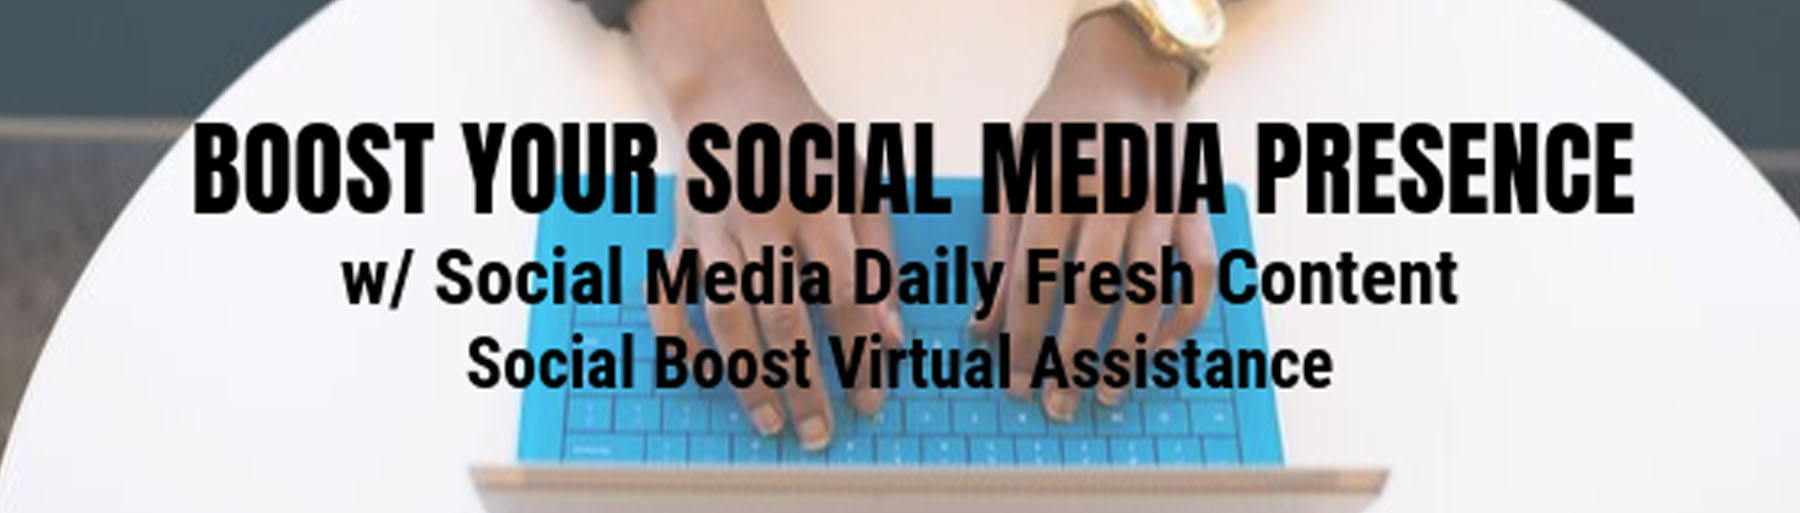 Social Boost Virtual Assistance